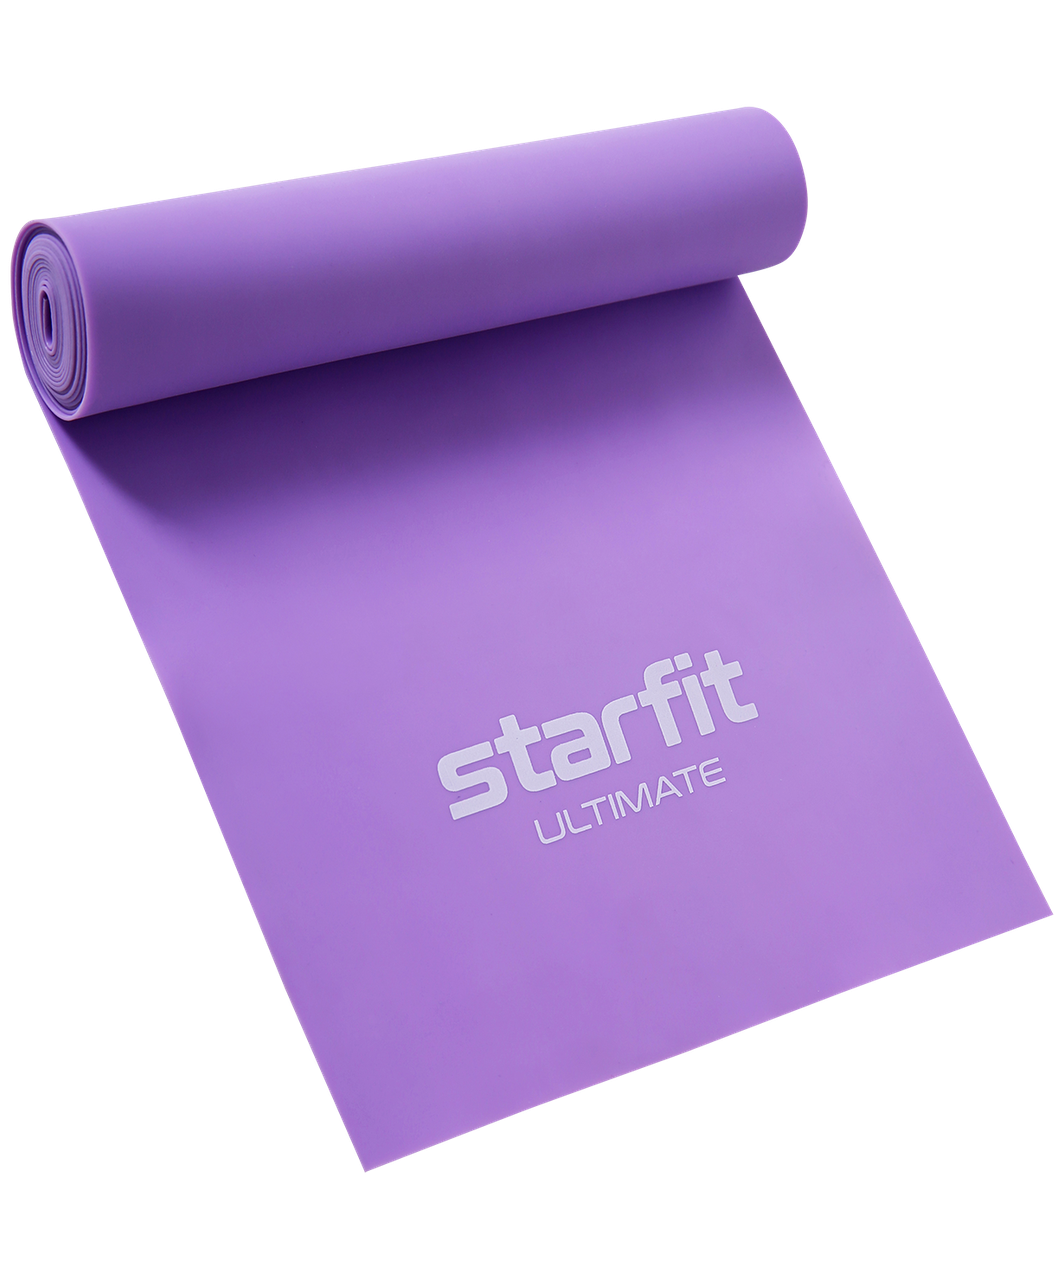 Лента для пилатеса Core ES-201  Starfit